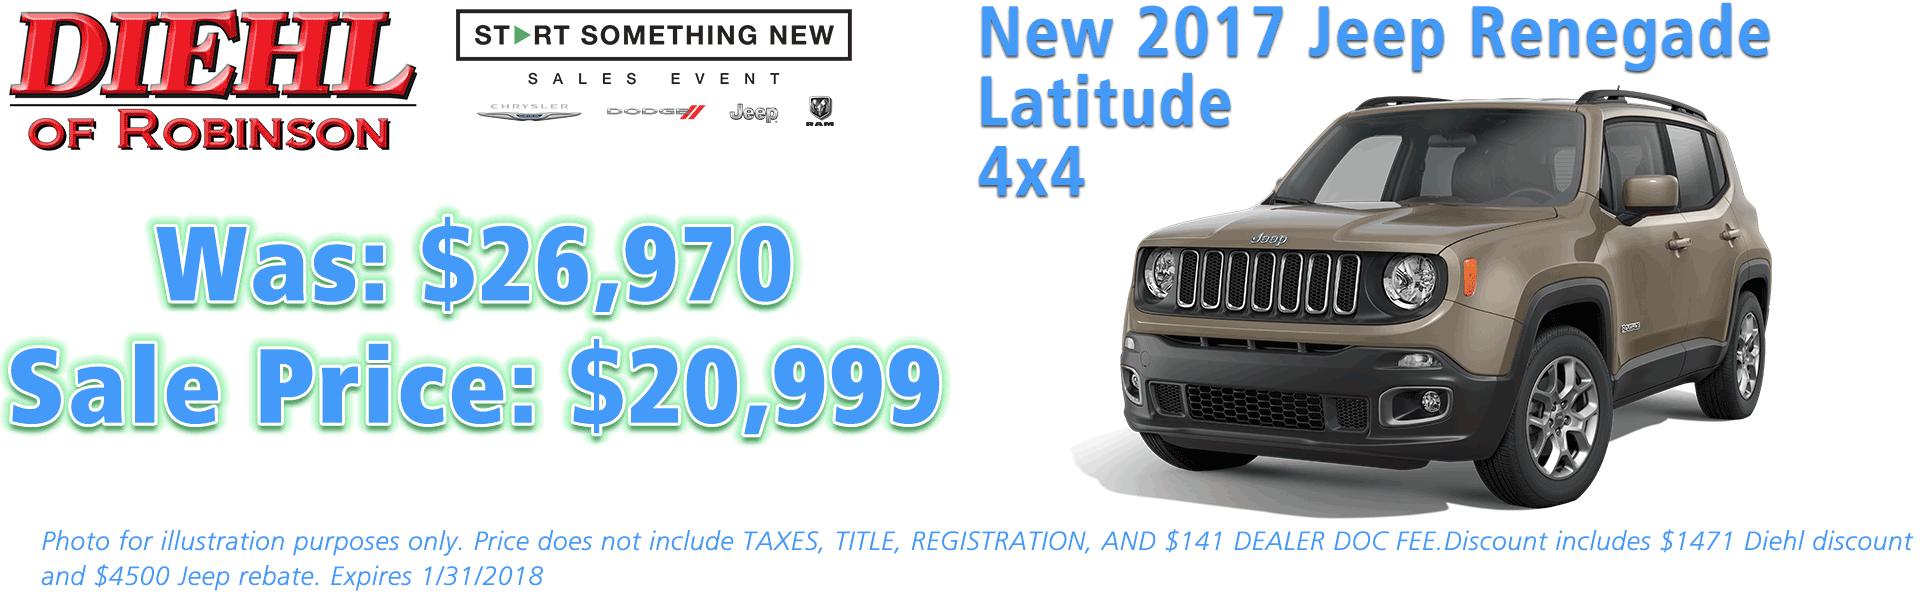 jeep renegade special latitude 4x4